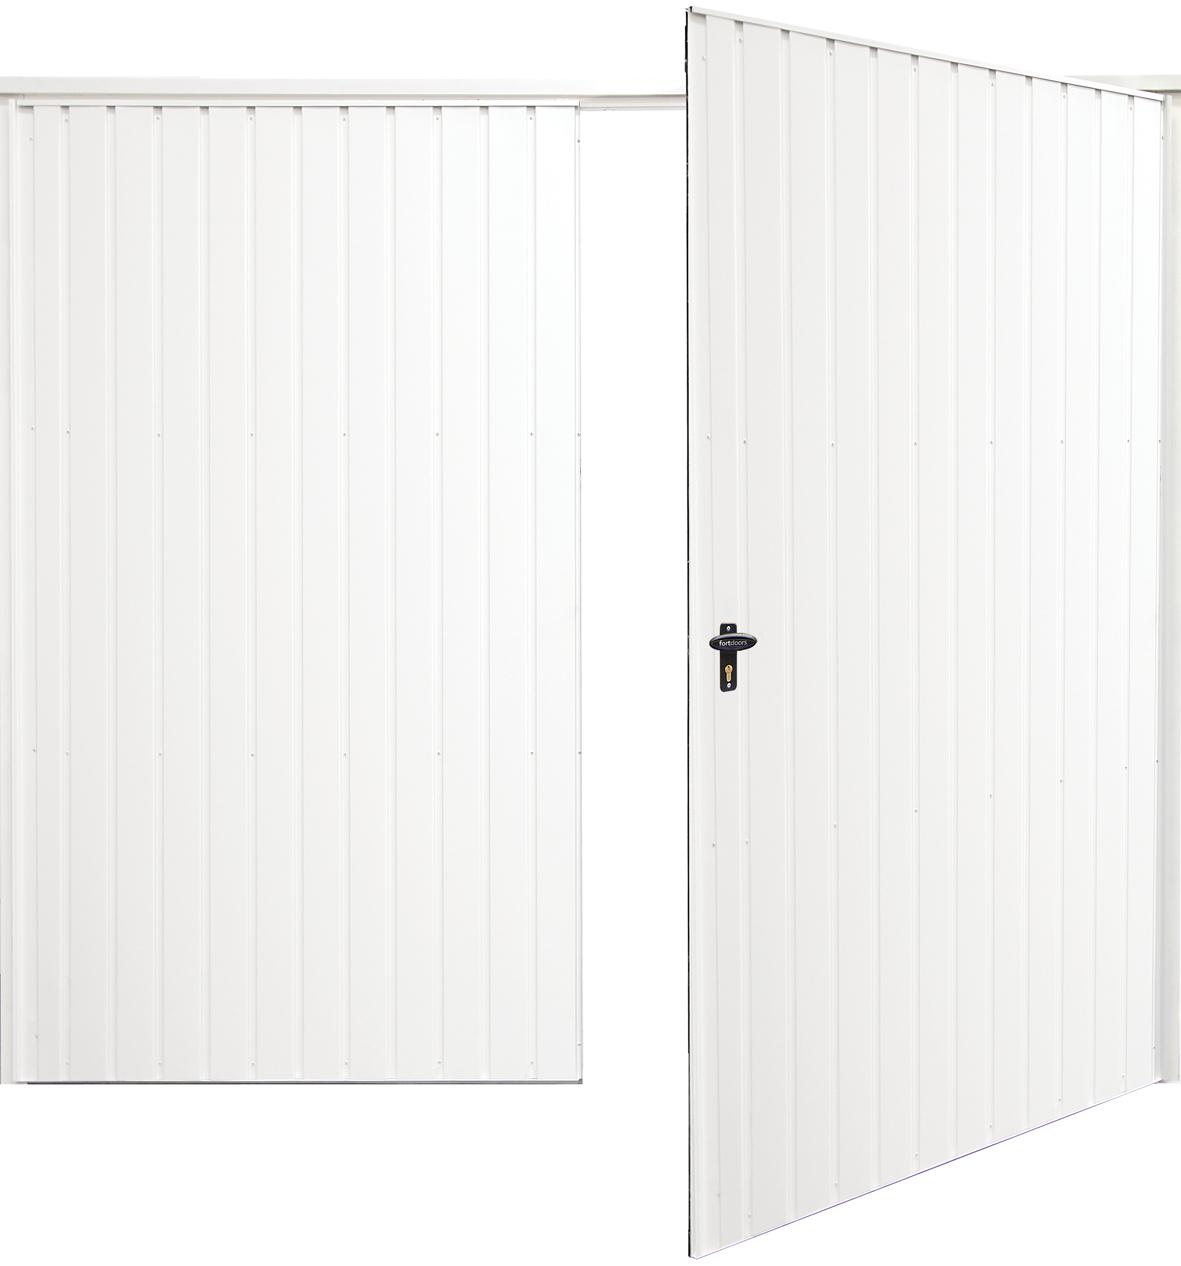 Timber upvc steel side hinged garage doors prices fort doors side hinged garage doors rubansaba